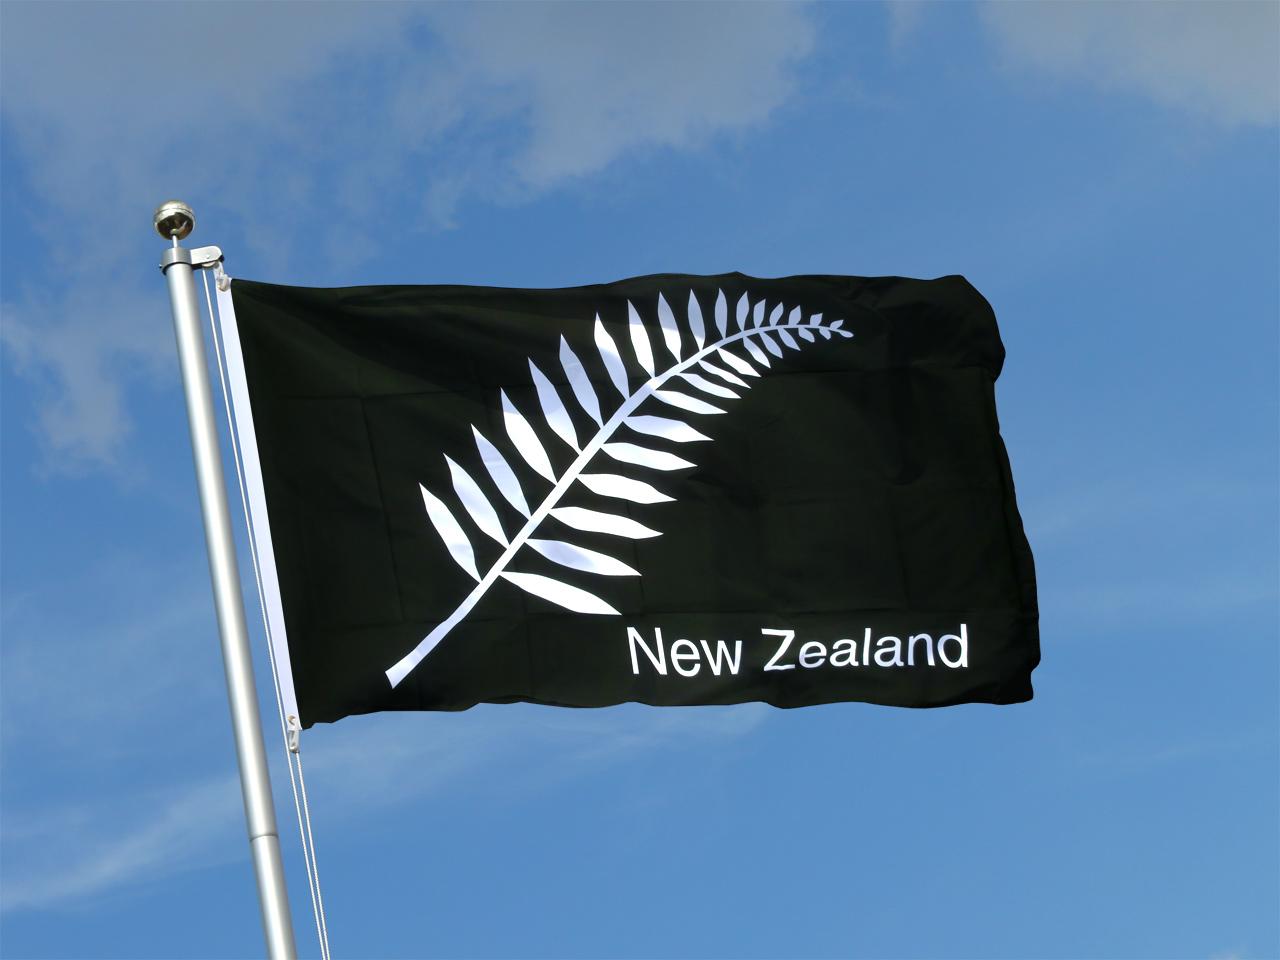 New Zealand feather all blacks - 3x5 ft Flag